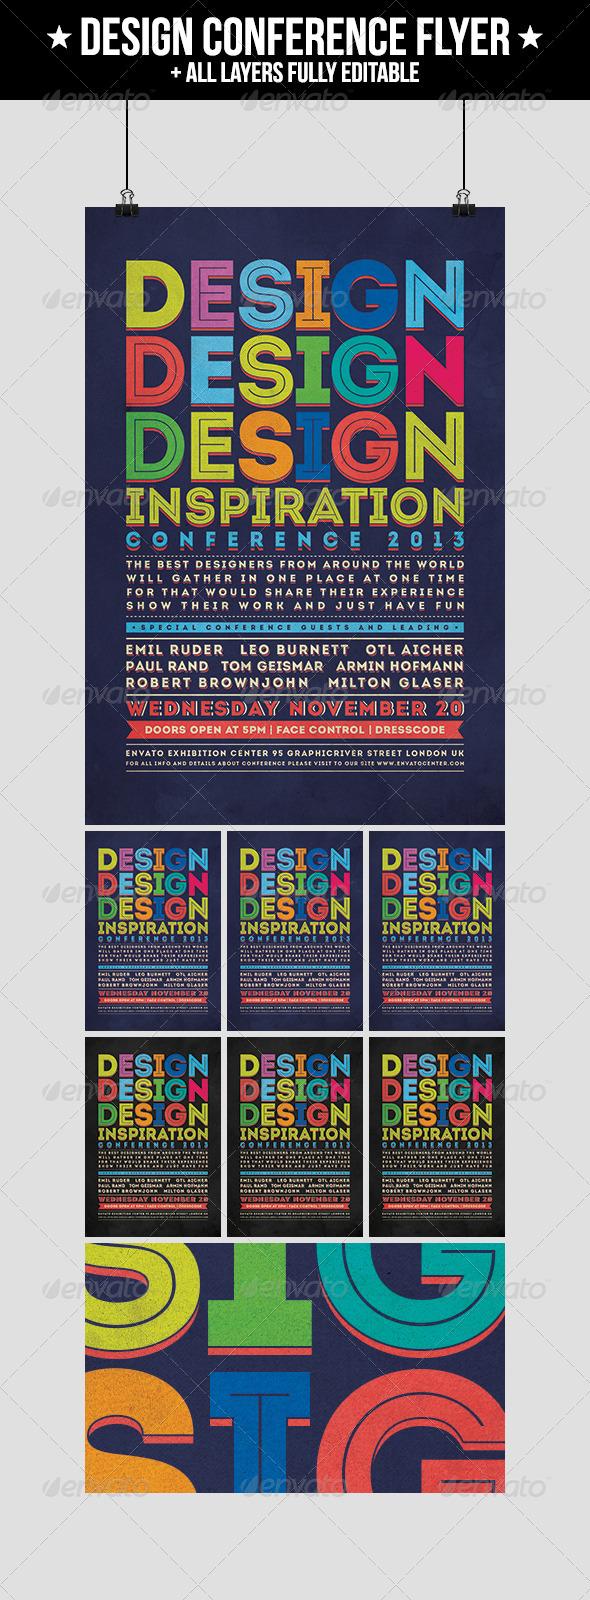 GraphicRiver Design Conference Flyer 4704527